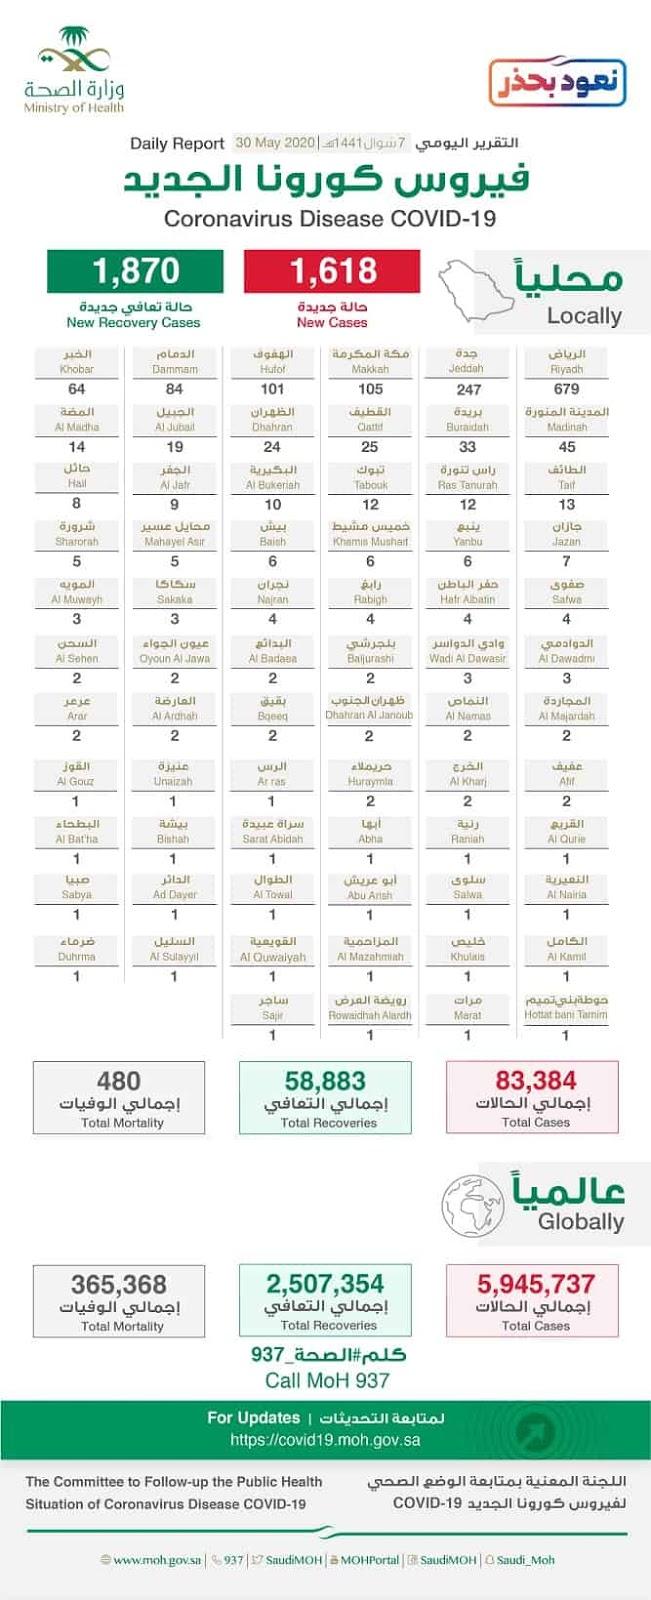 Corona Virus cases in Saudi Arabia on 30th May 2020 - Saudi-Expatriates.com